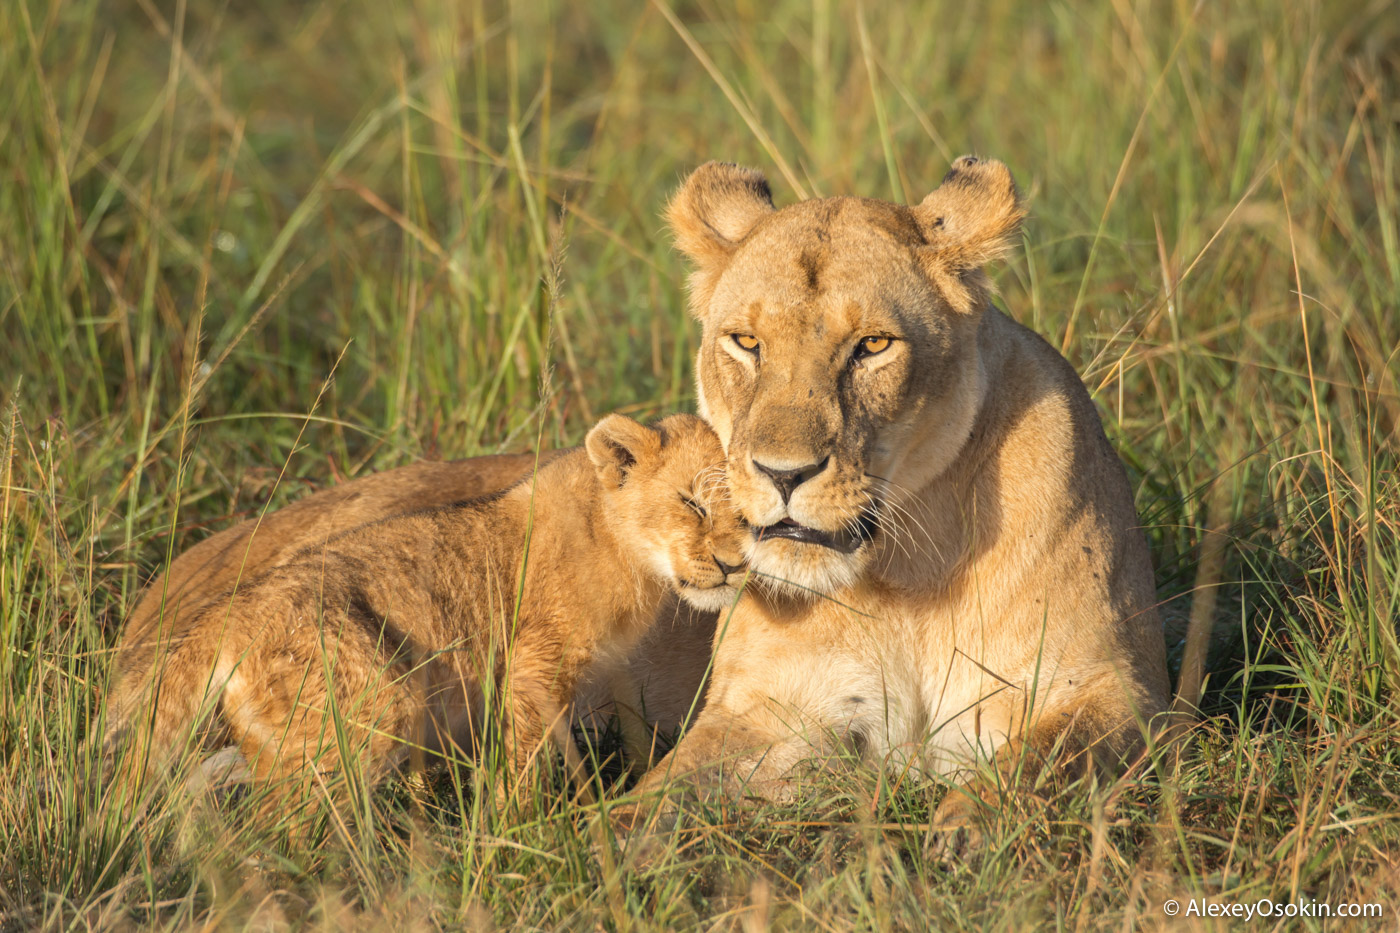 lion-cubs-03-2016-p2-ao-2.jpg